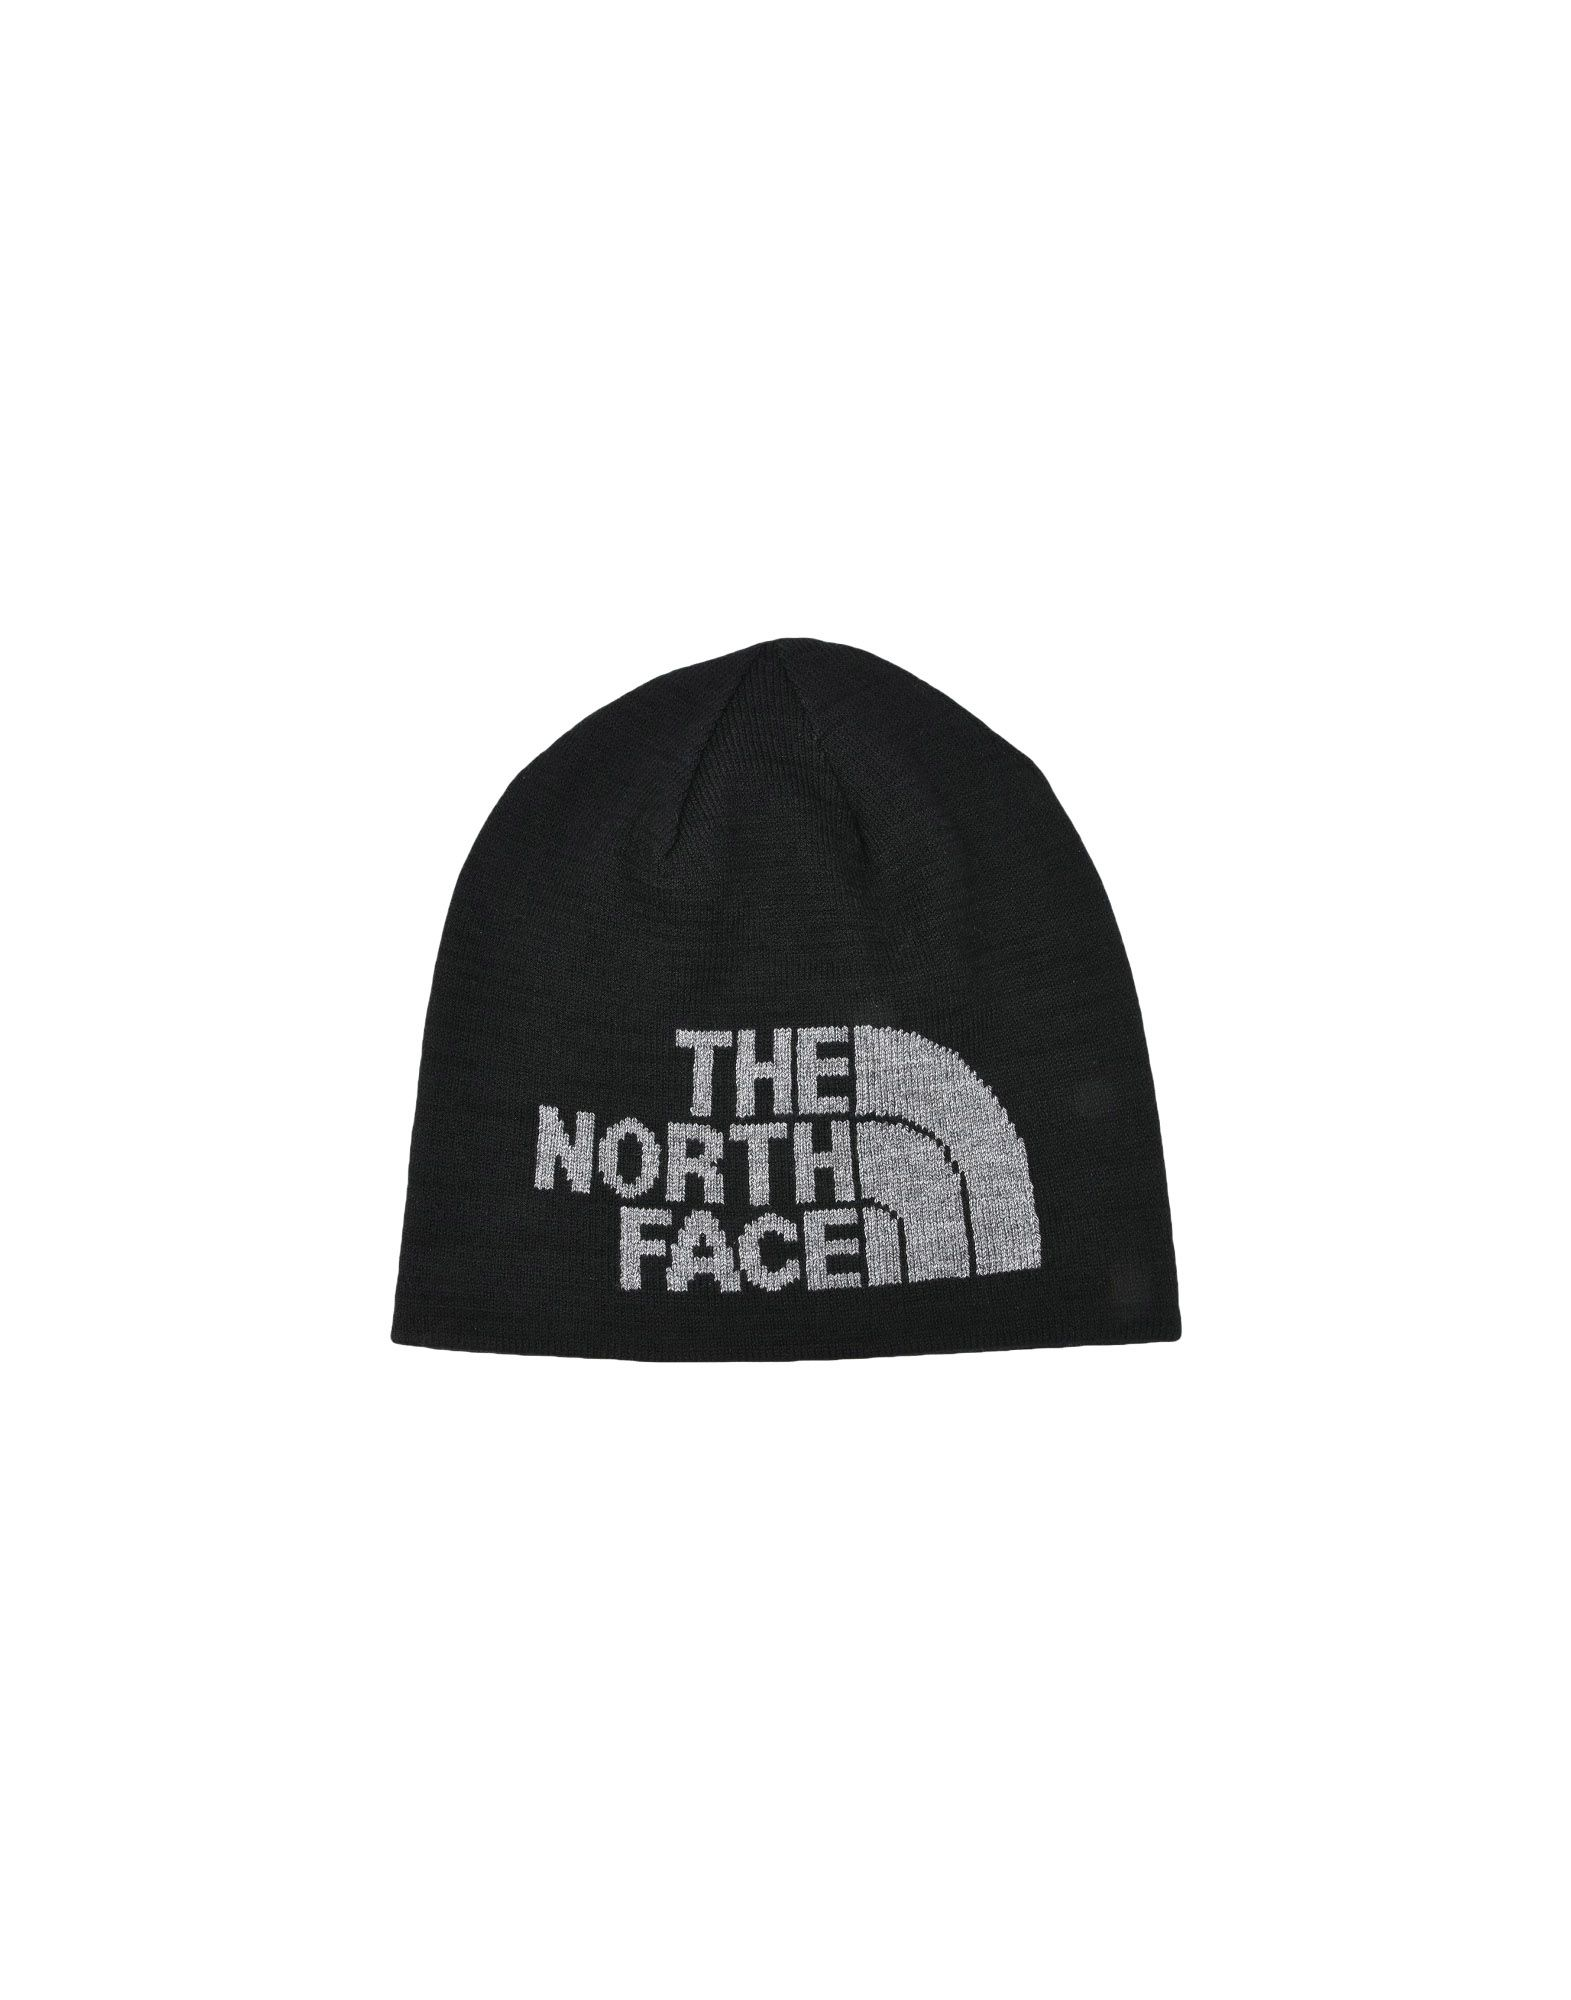 THE NORTH FACE Головной убор головной убор of the cap 8015031601